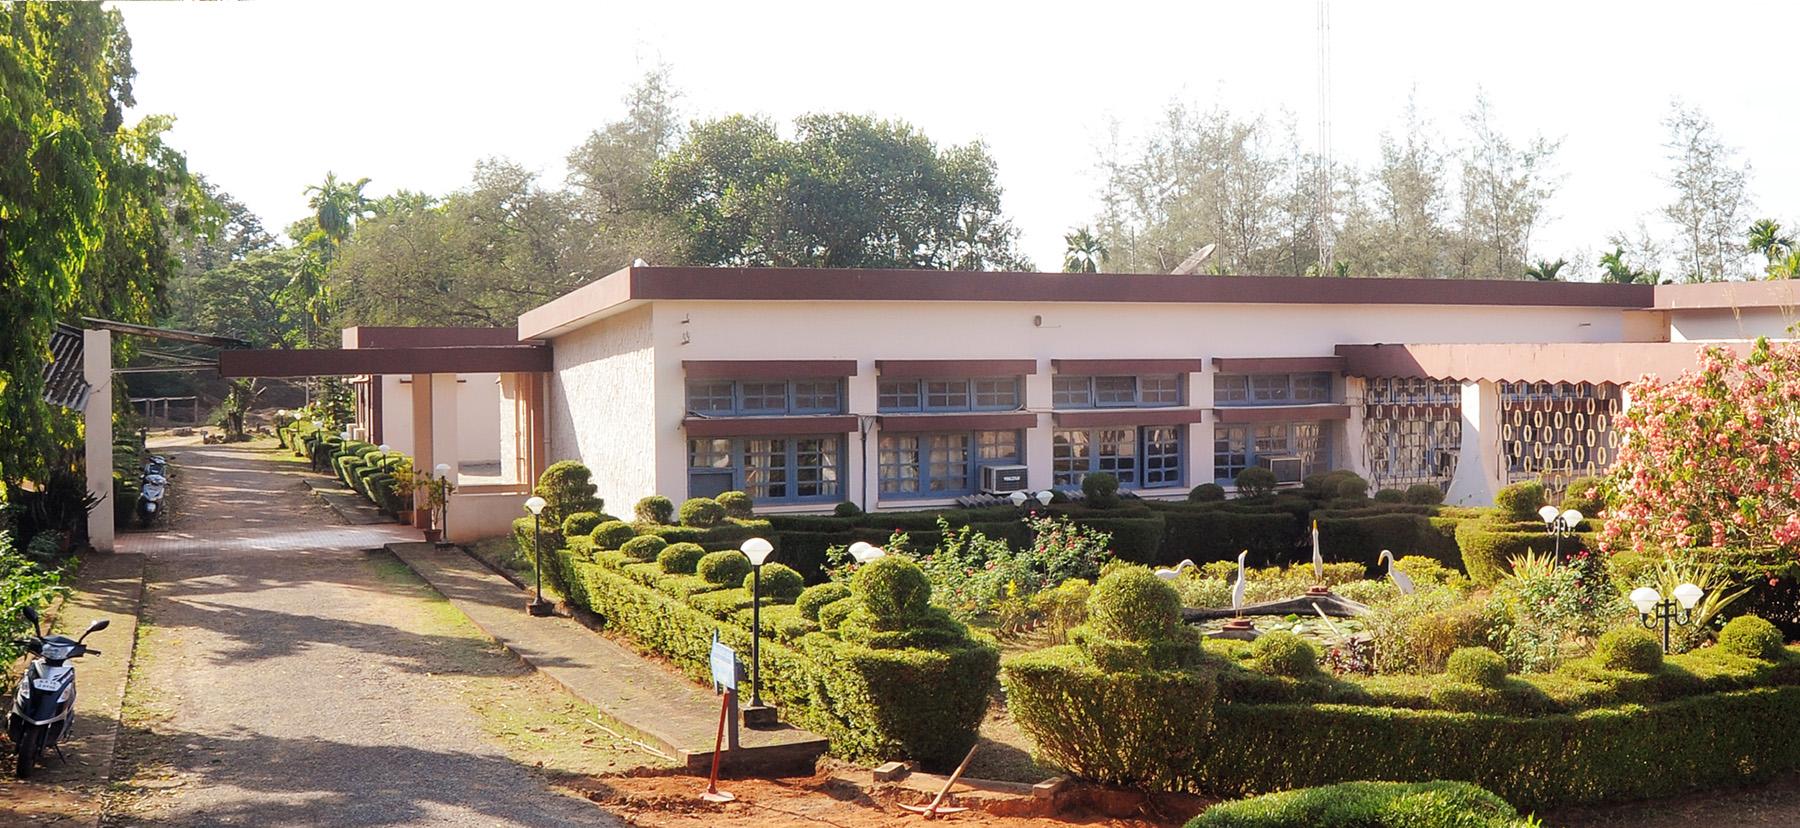 ICAR - CPCRI Regional Station, Vittal